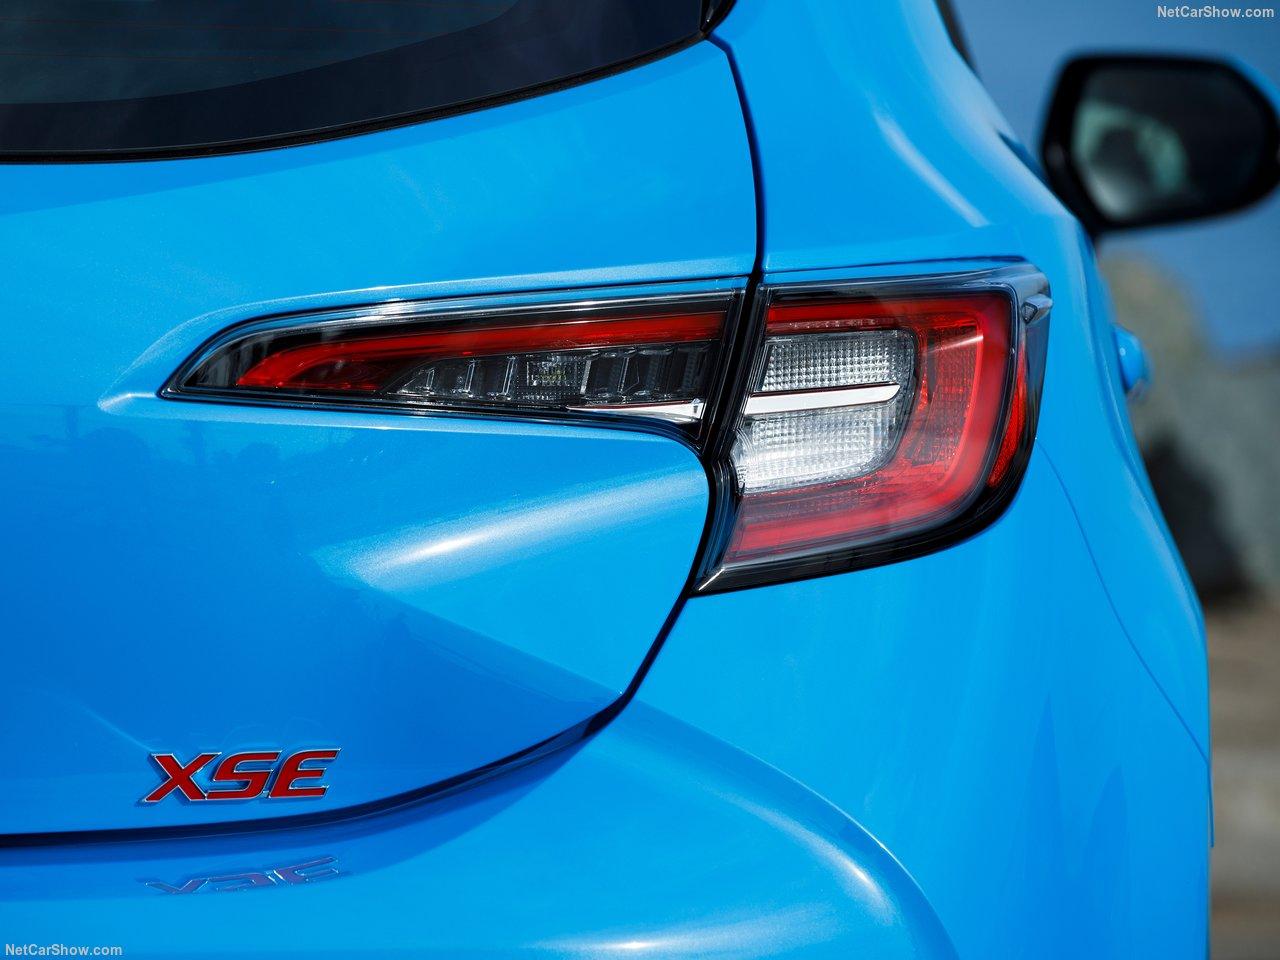 Toyota-Corolla_Hatchback-2019-1280-63.jpg